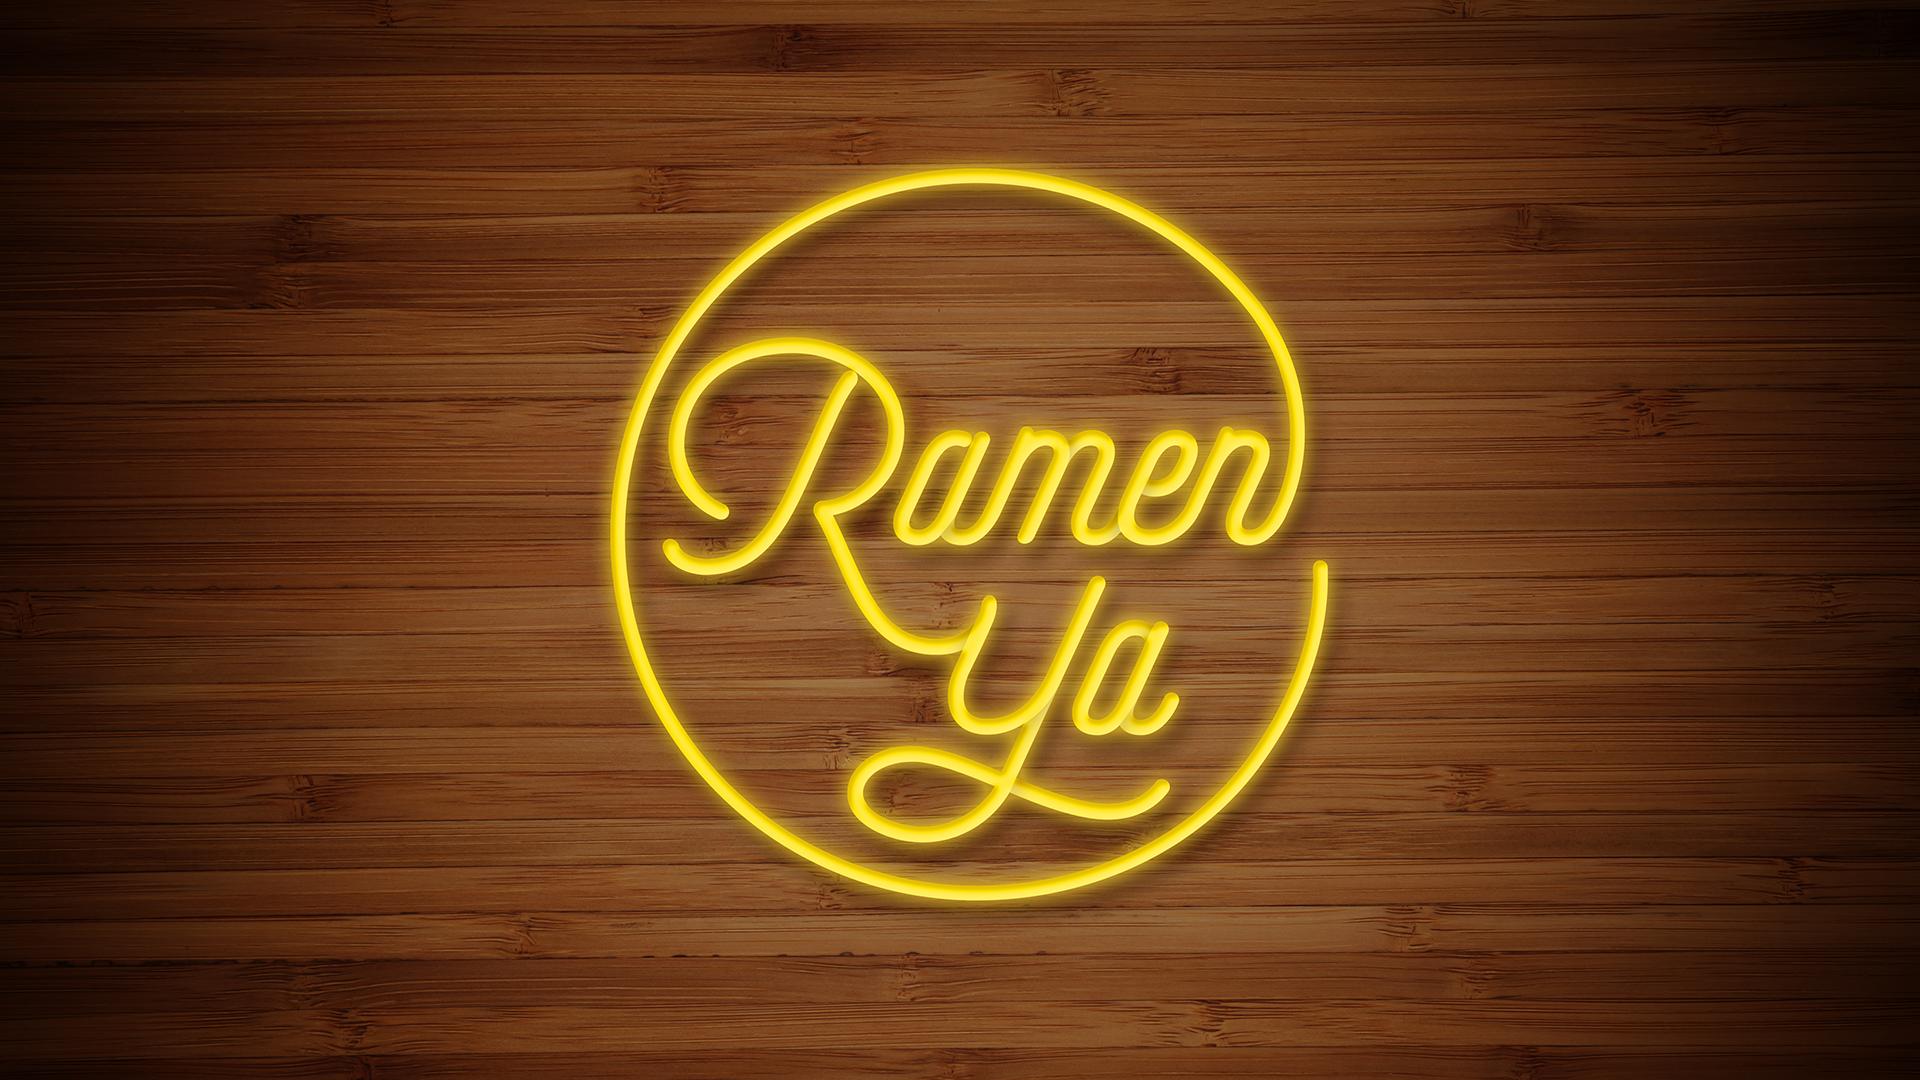 RamenYa_1.png